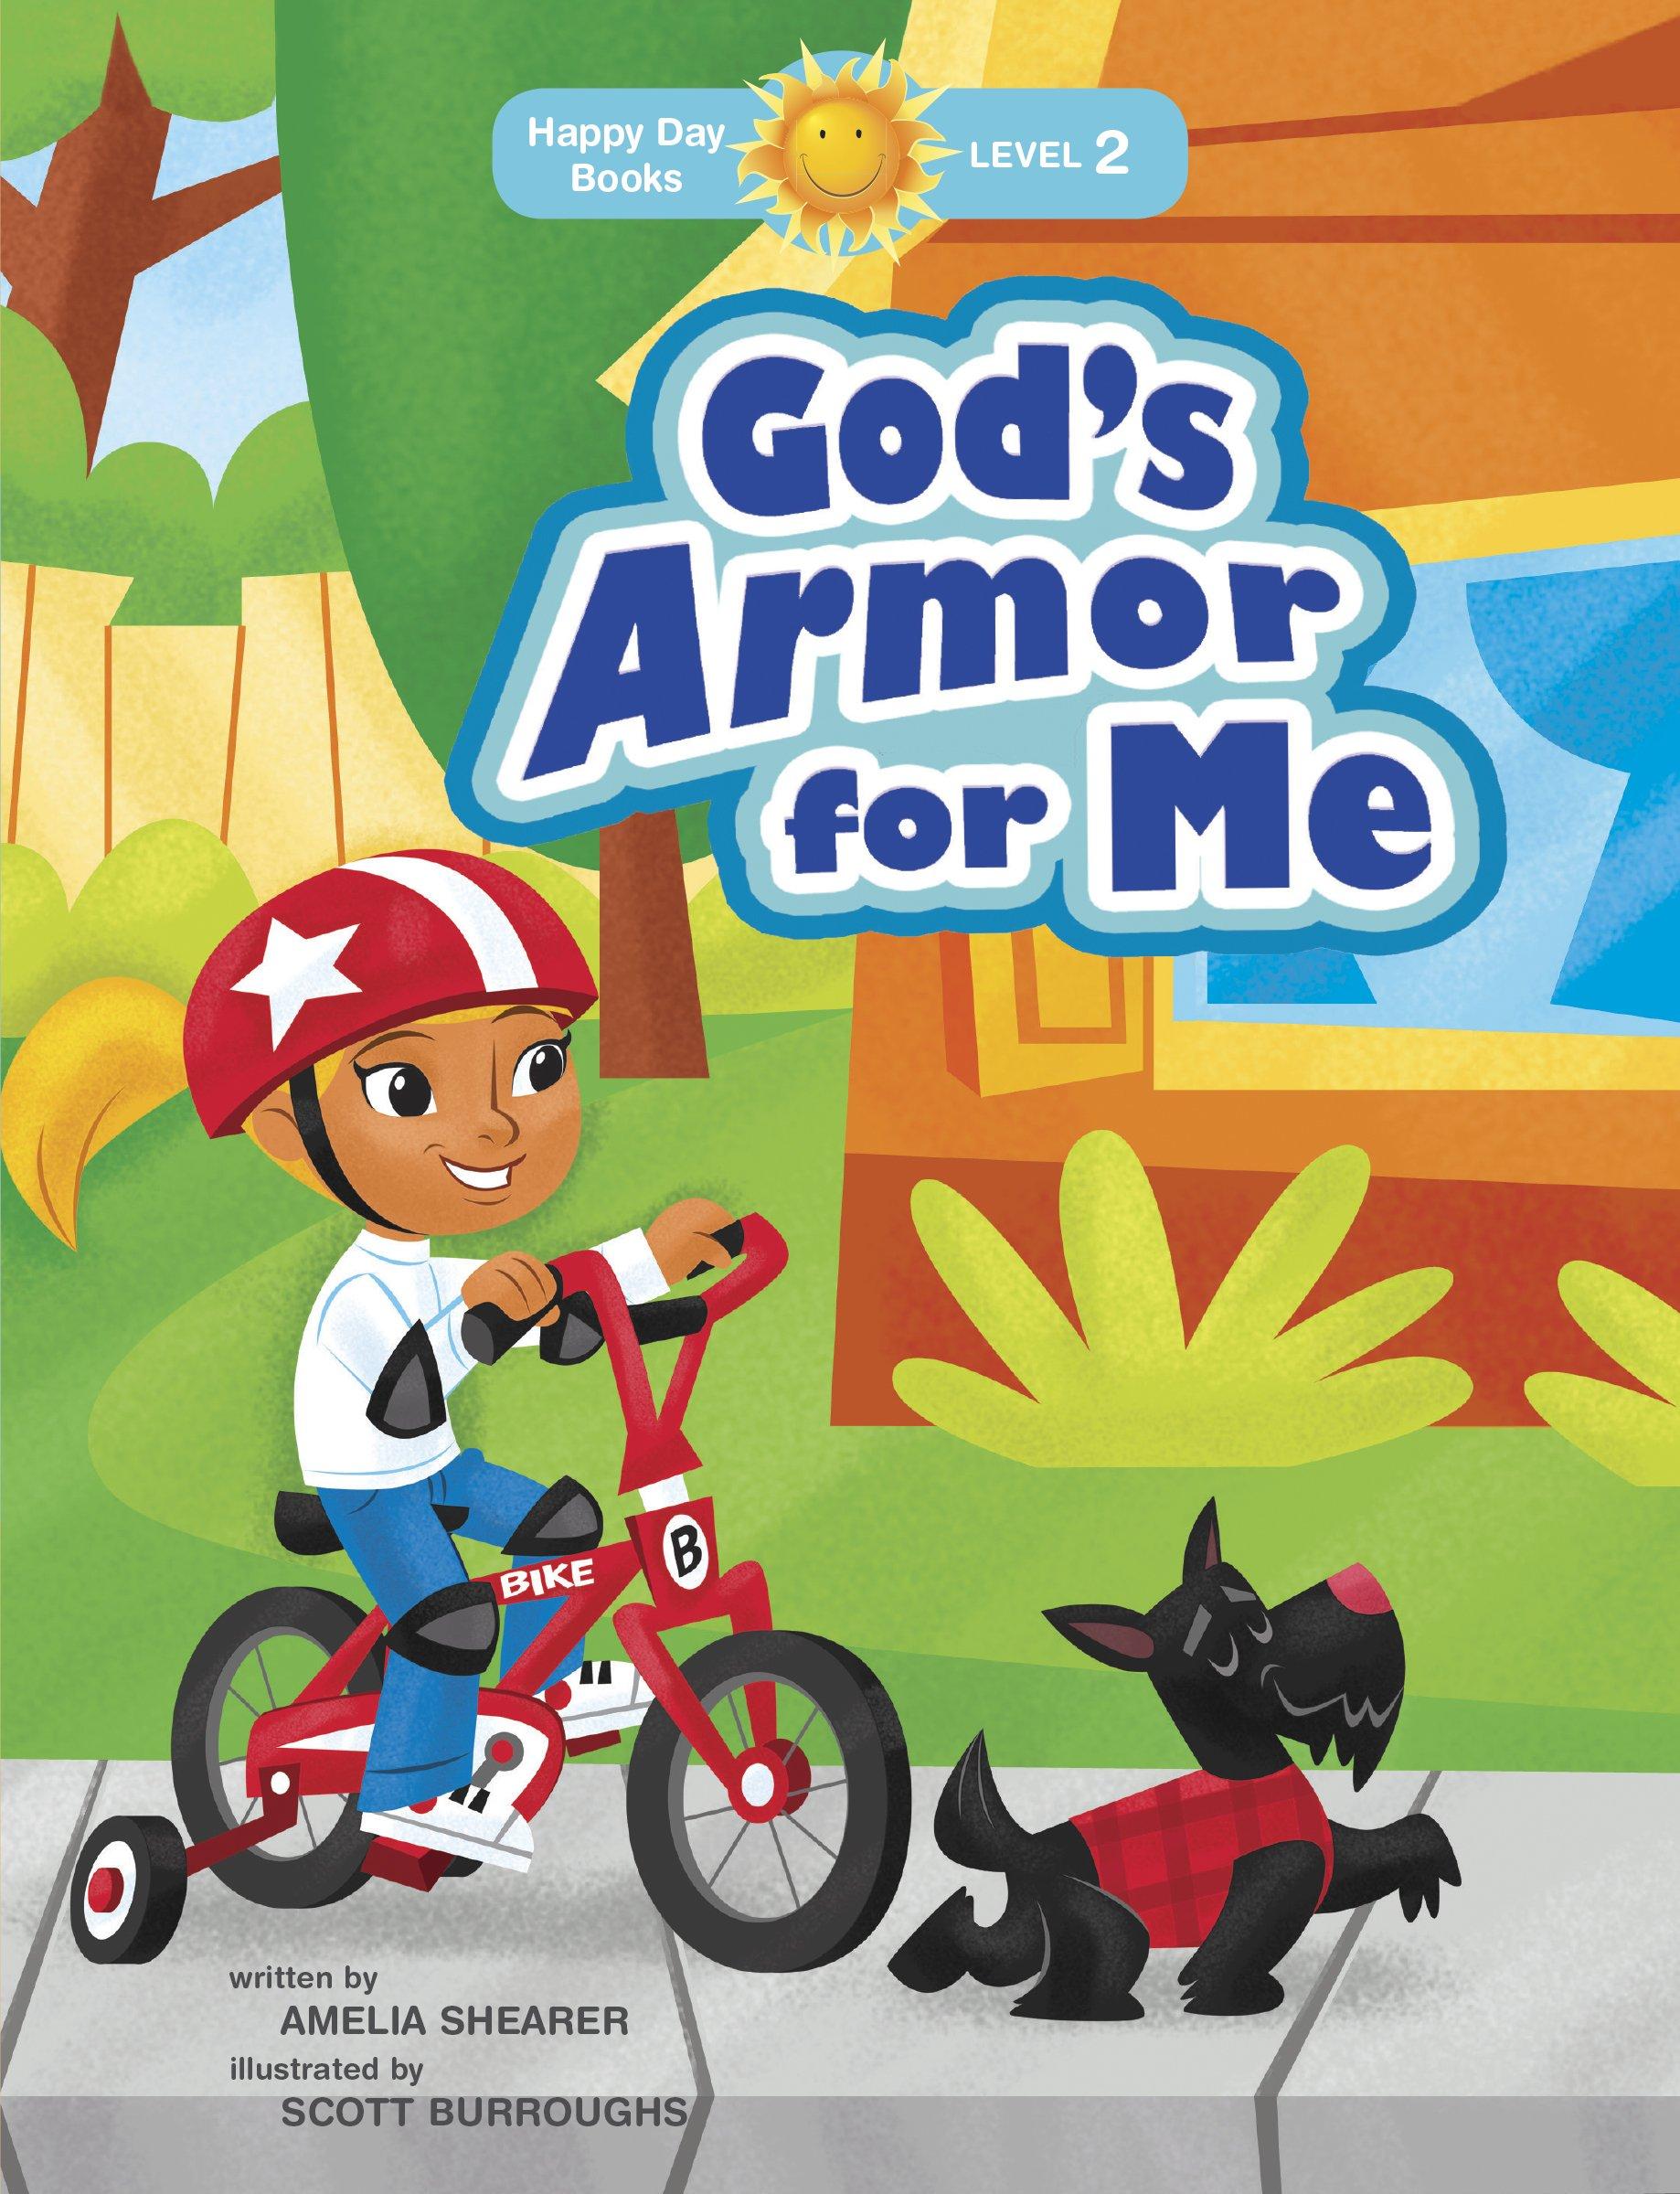 god u0027s armor for me happy day amelia shearer scott burroughs